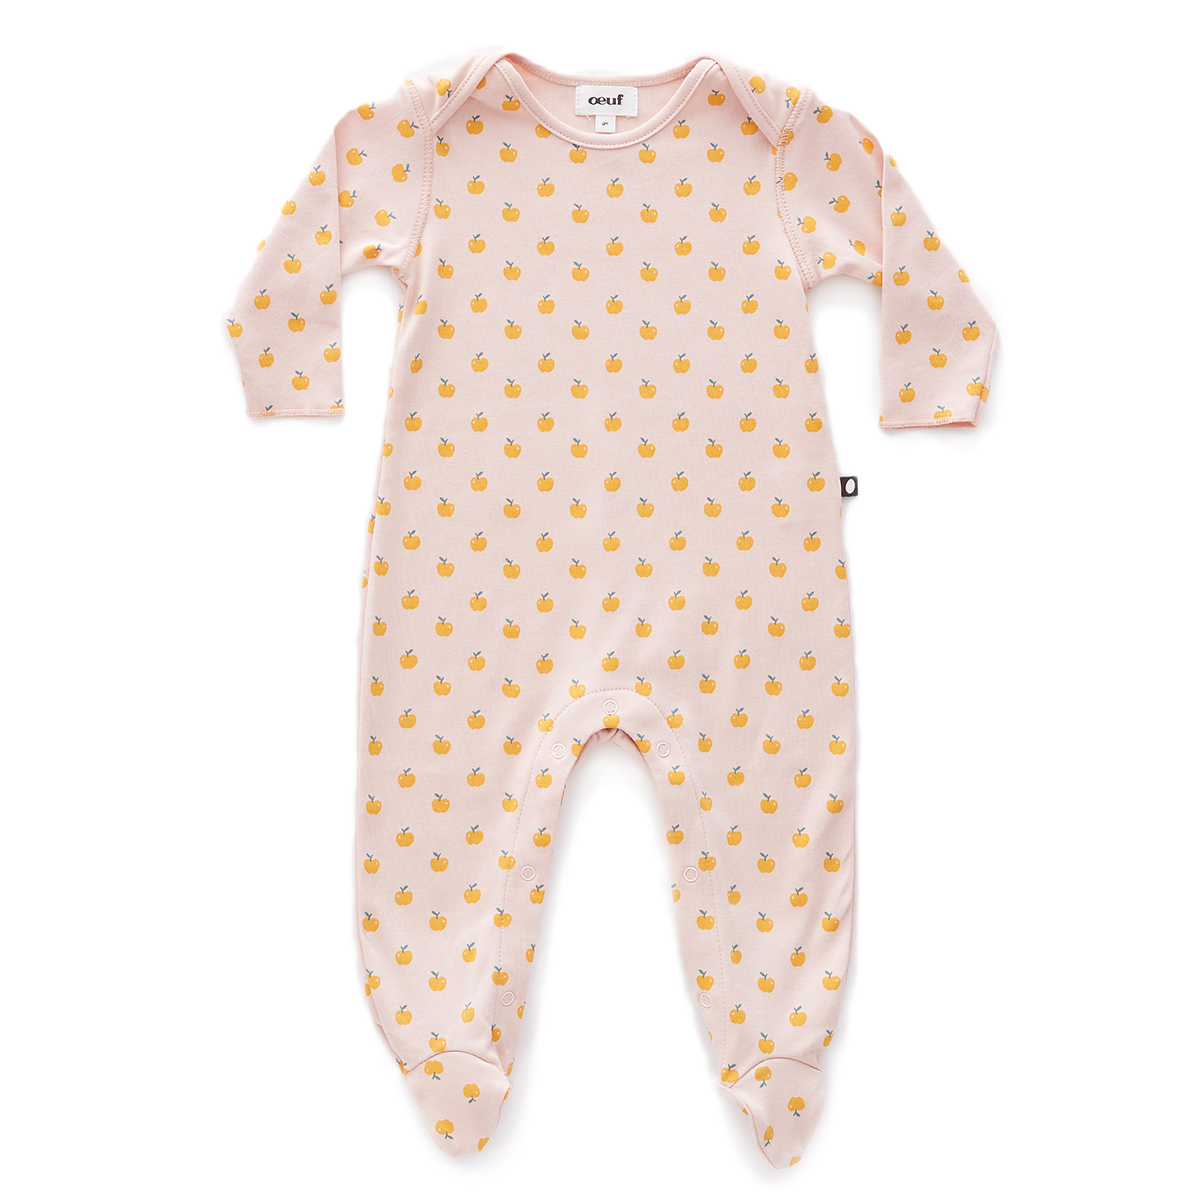 Body et Pyjama Pyjama Pommes Rose - 6 Mois Pyjama Pommes Rose - 6 Mois